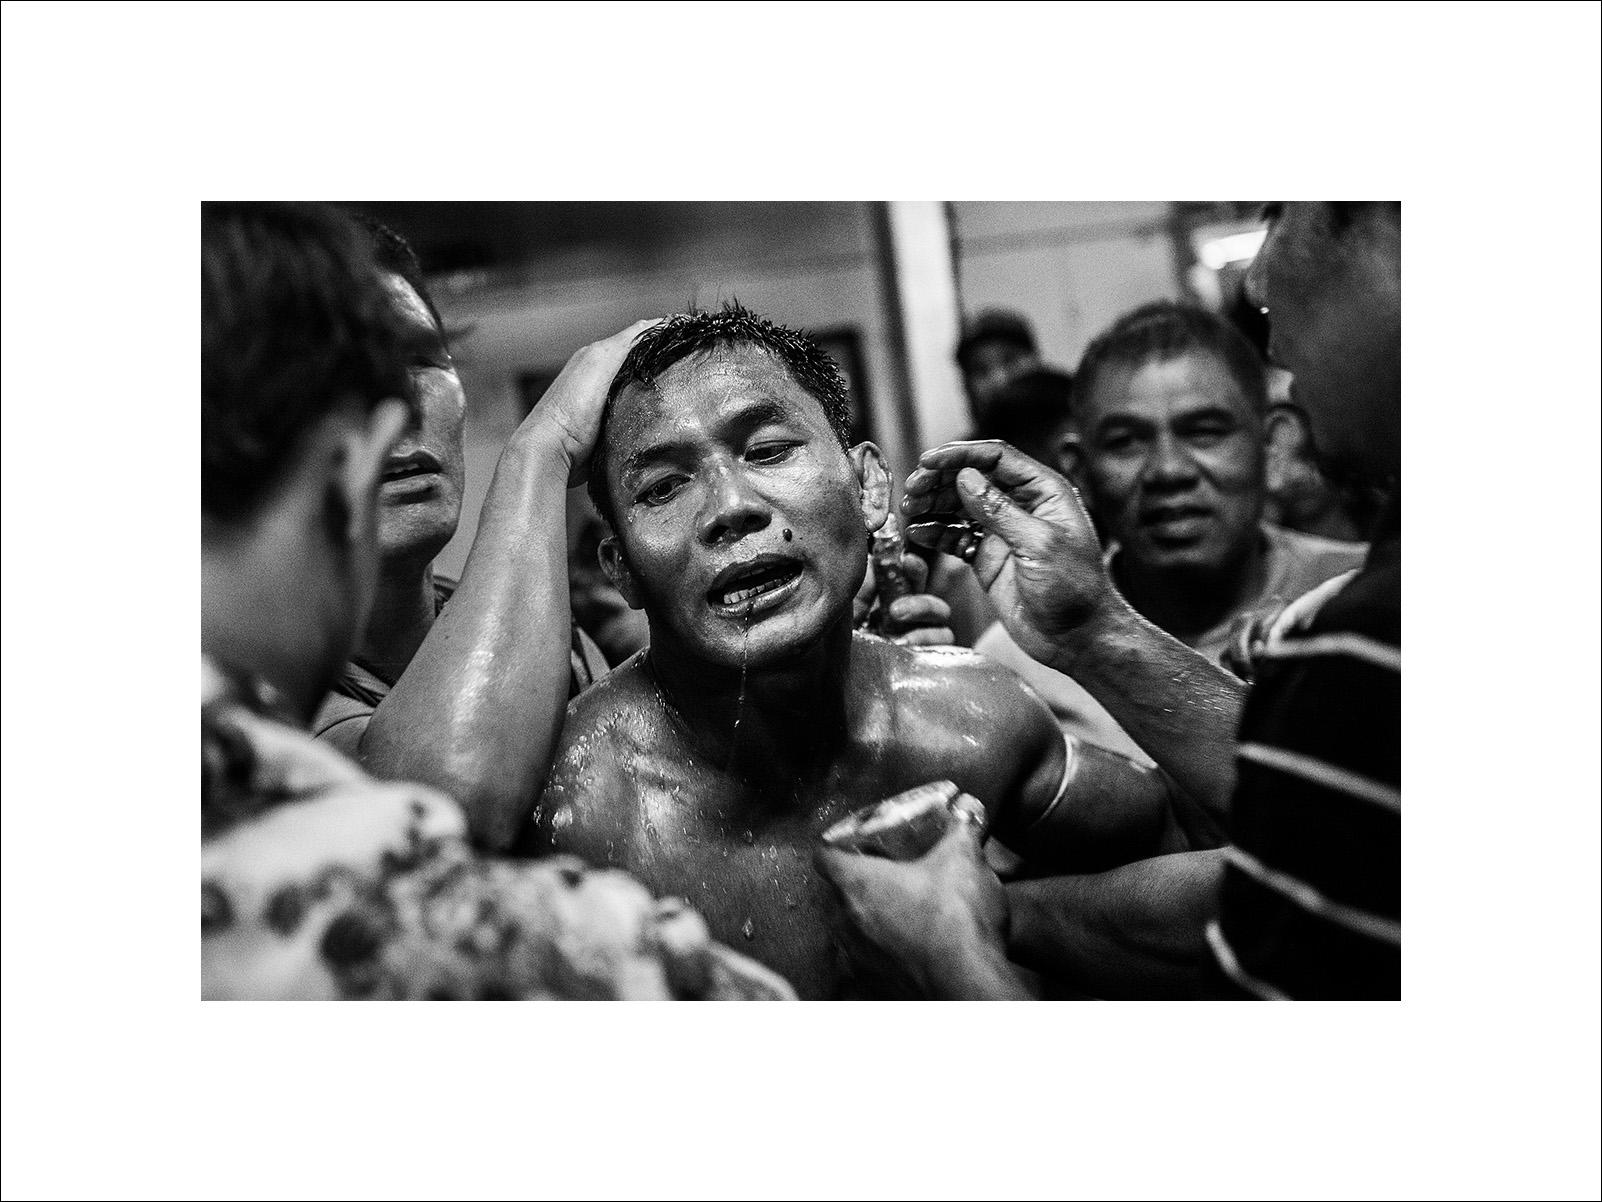 Muay Thai Boxing - Boxe Thaïe - Bangkok